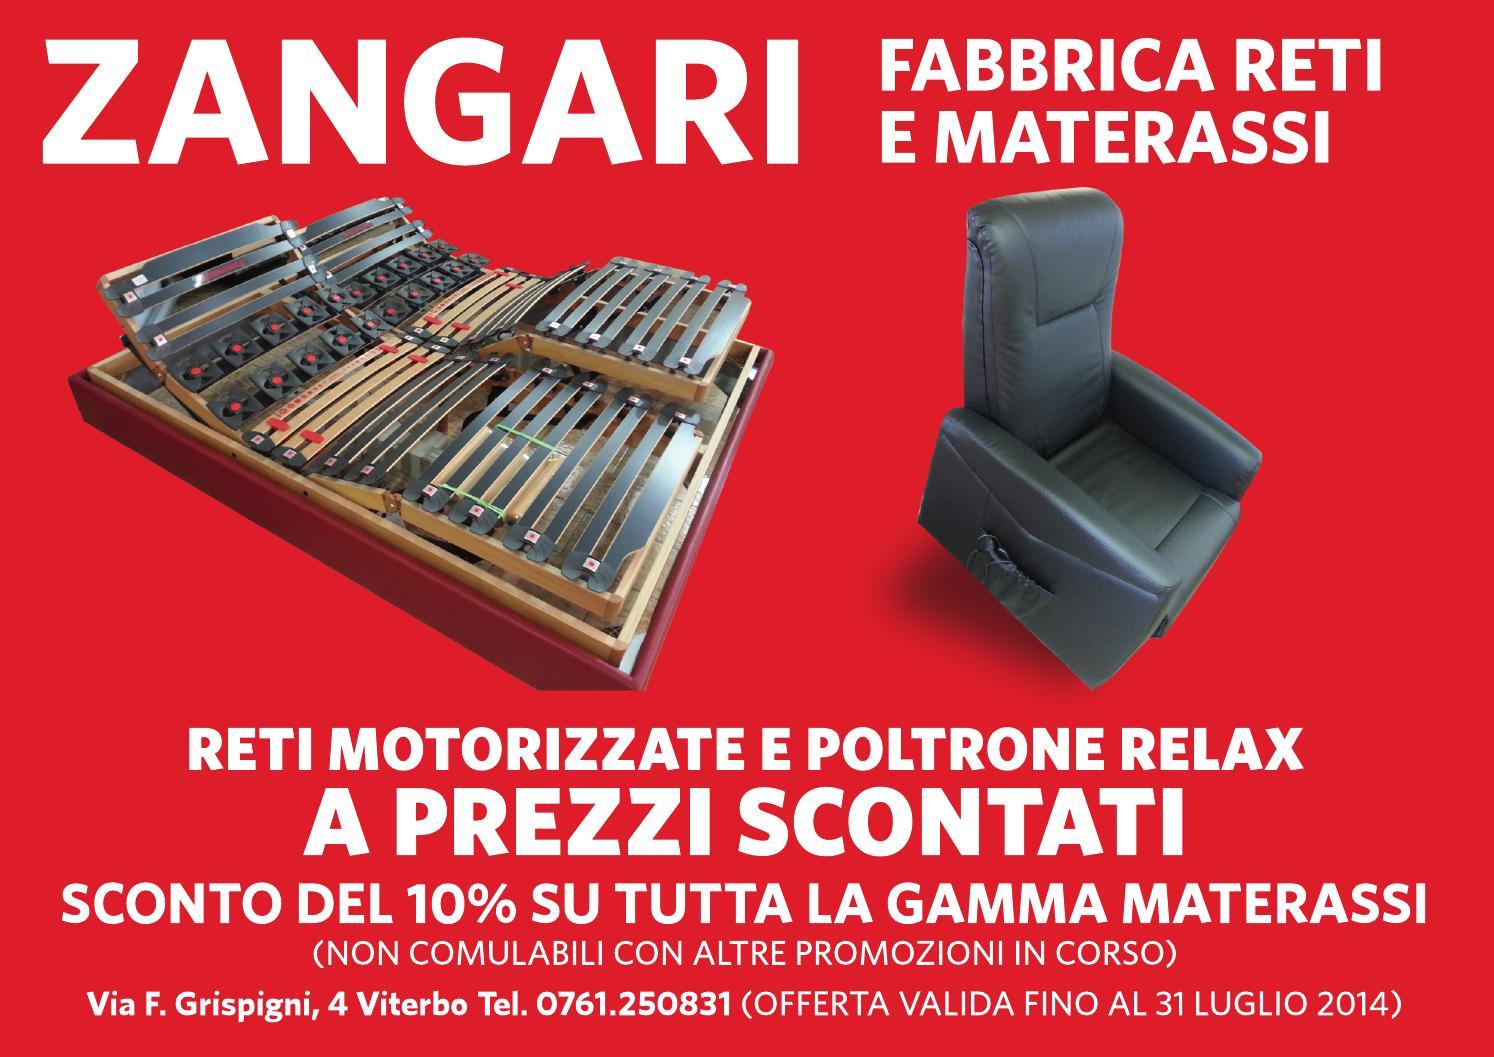 Materassi Zangari Viterbo.A5 Zangari Retro By Laziouno Wm Issuu